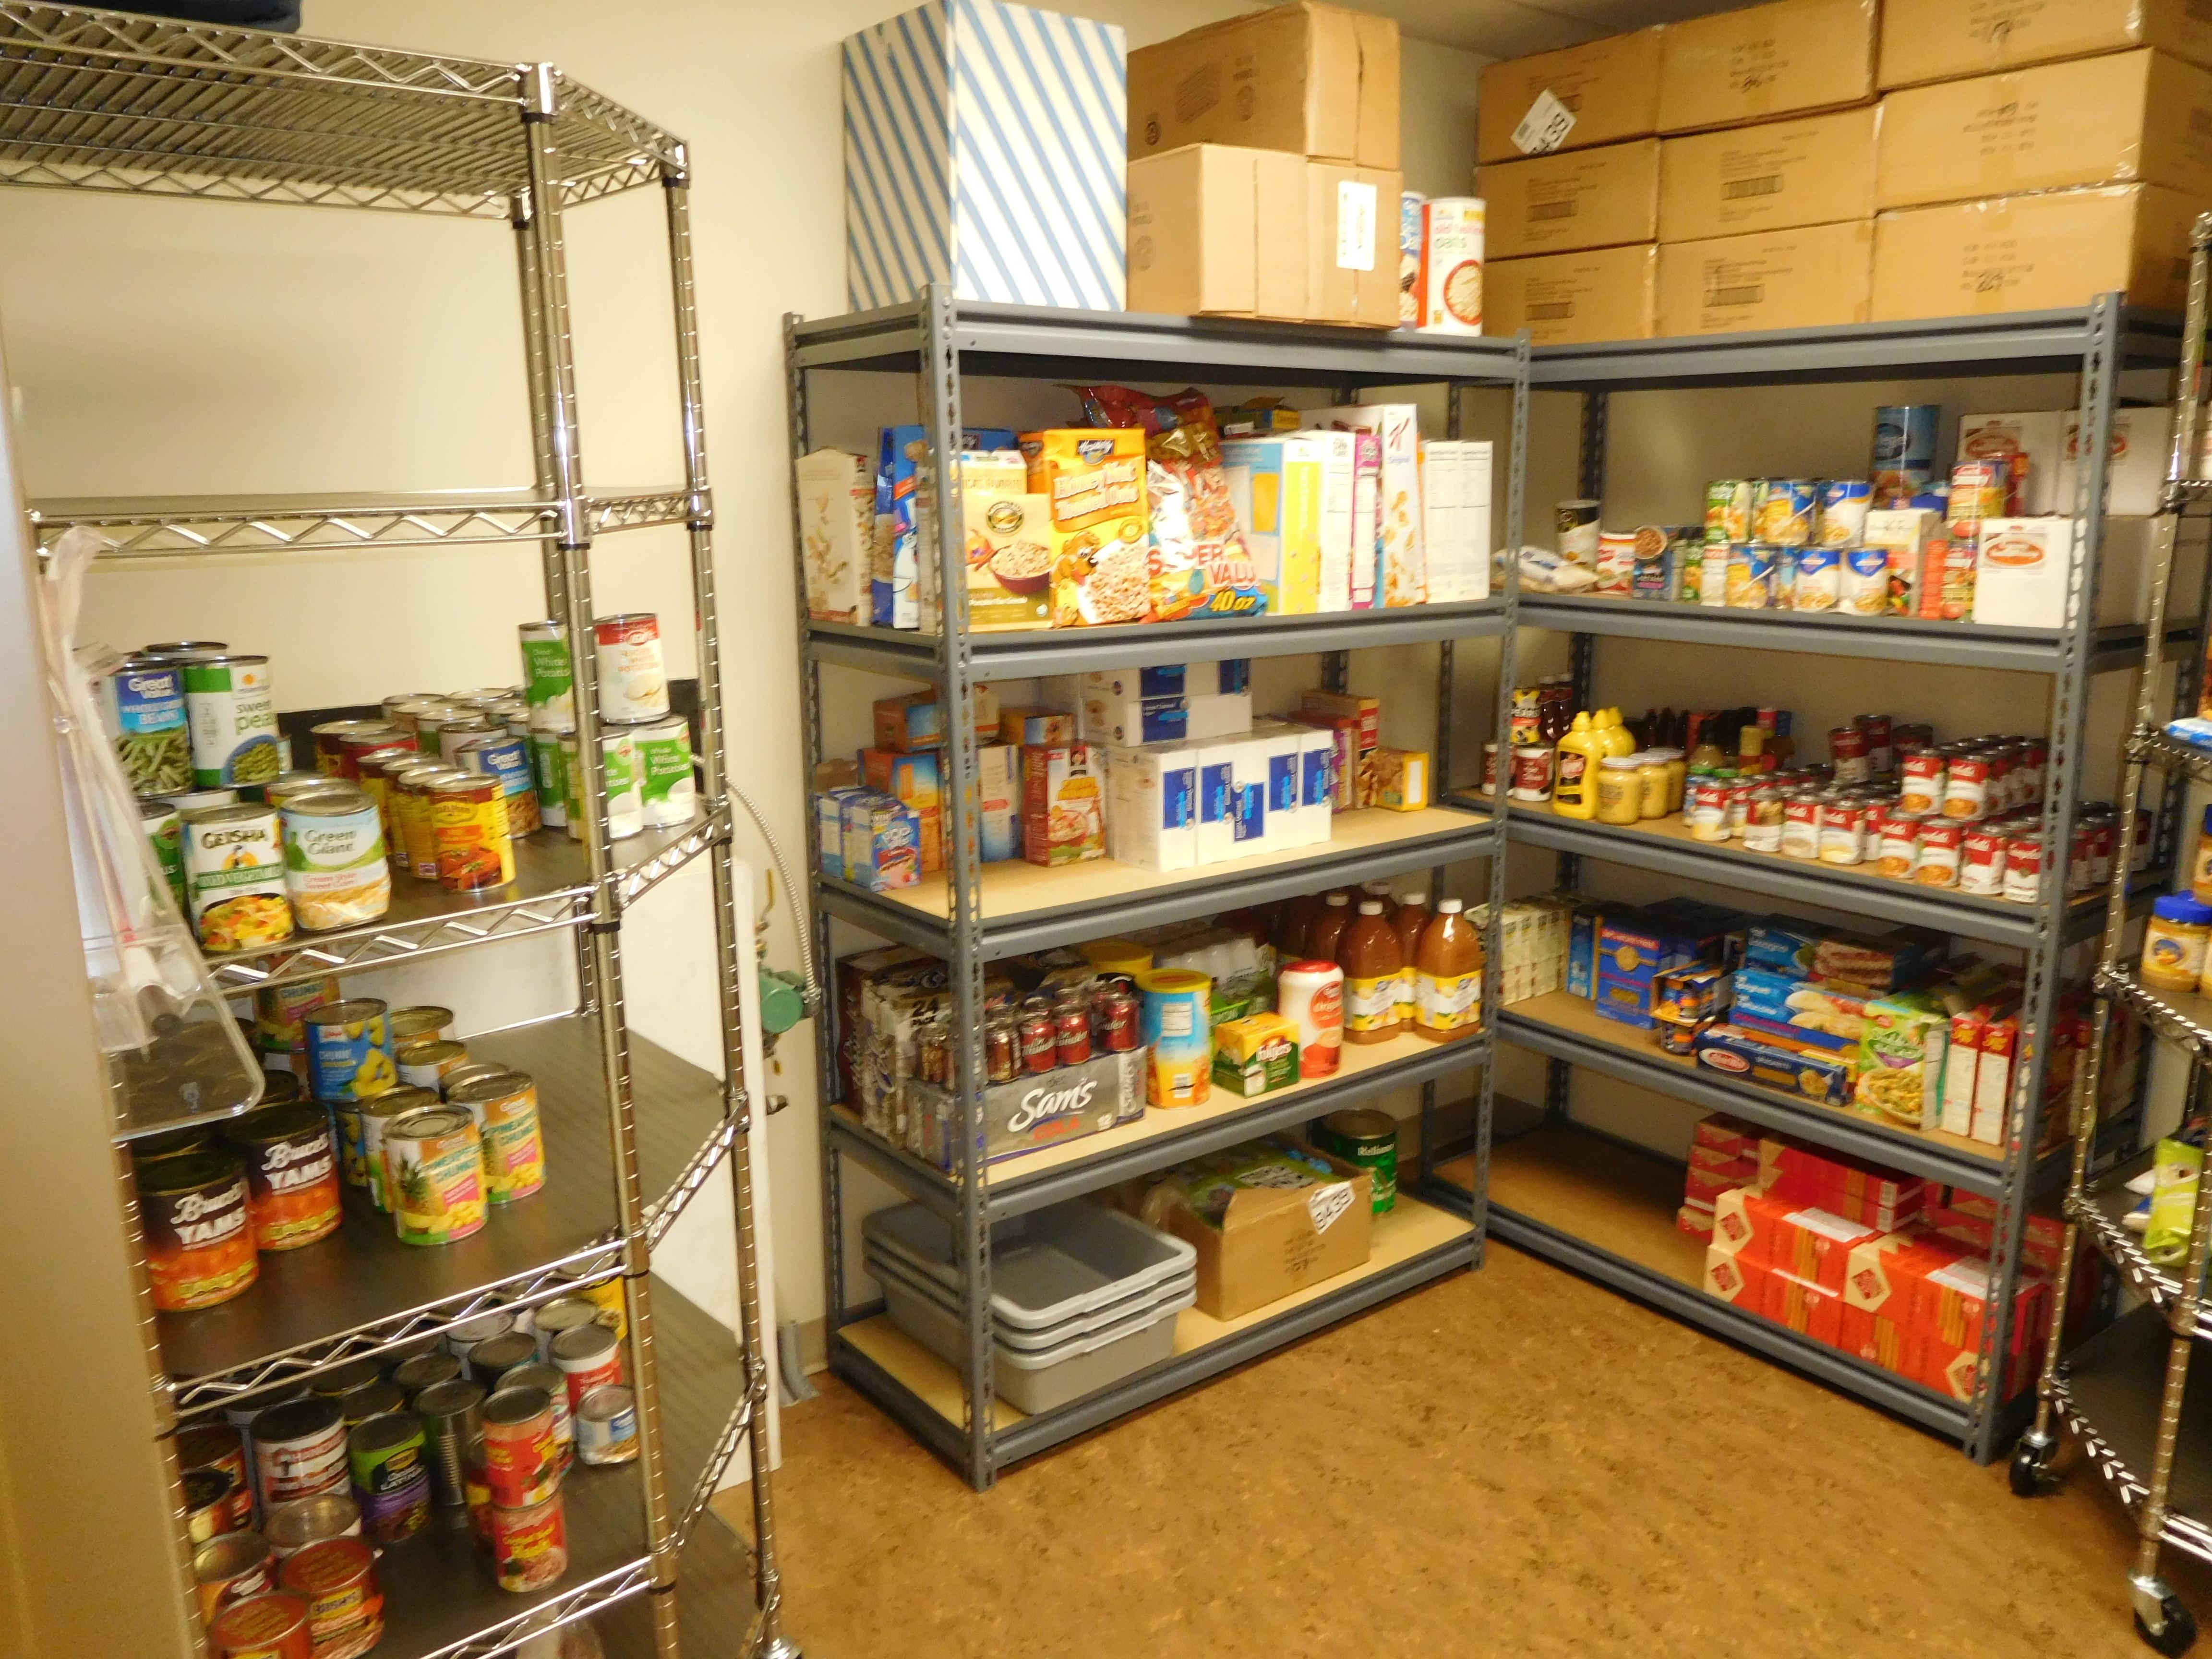 Lori Fecteau Good Shepherd Food Bank